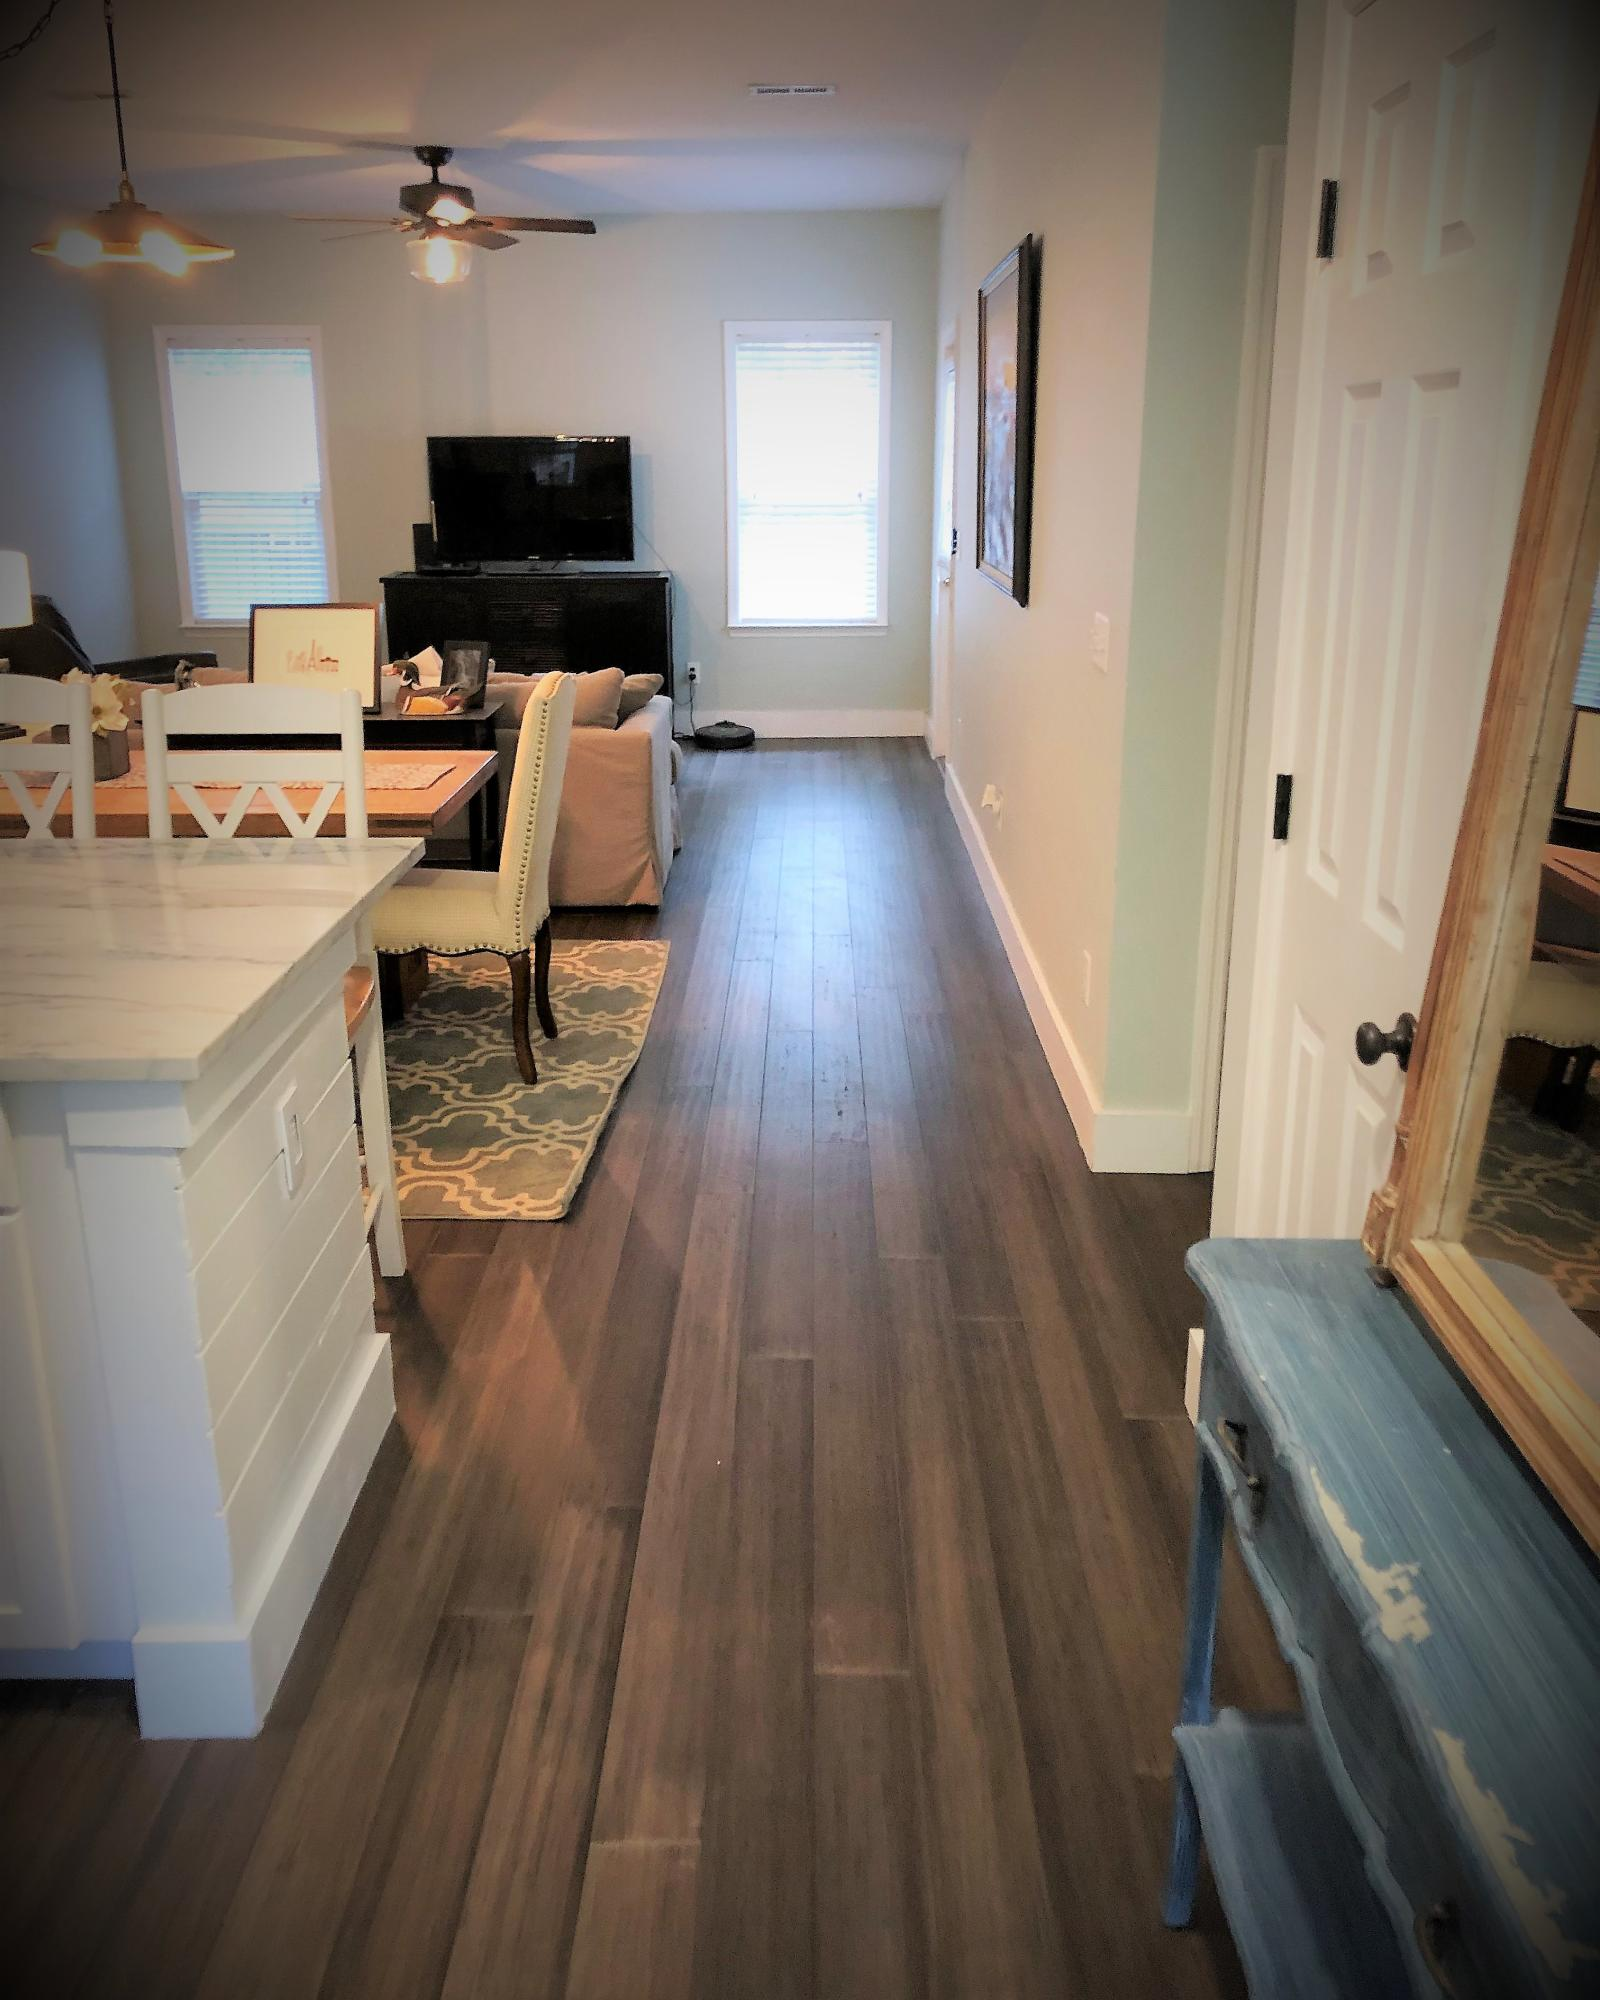 Fairway Villas Homes For Sale - 1542 Little Rock, Charleston, SC - 10